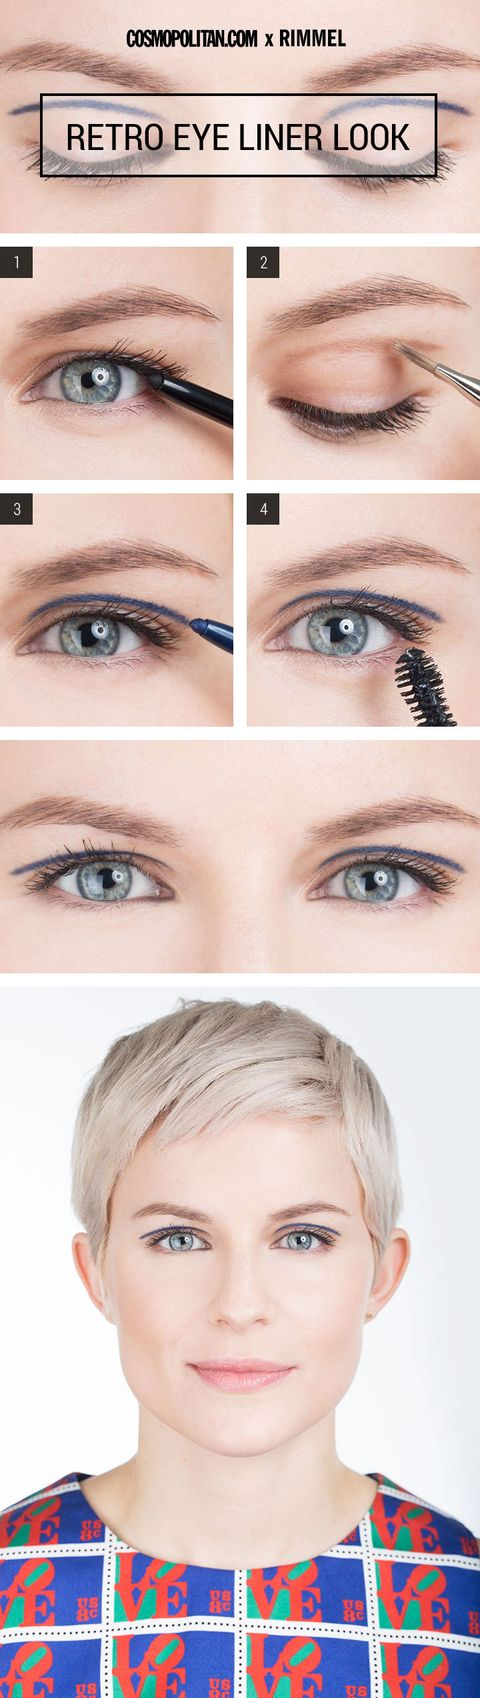 Retro Eye Makeup Look Mod Eyeliner Makeup Tutorial